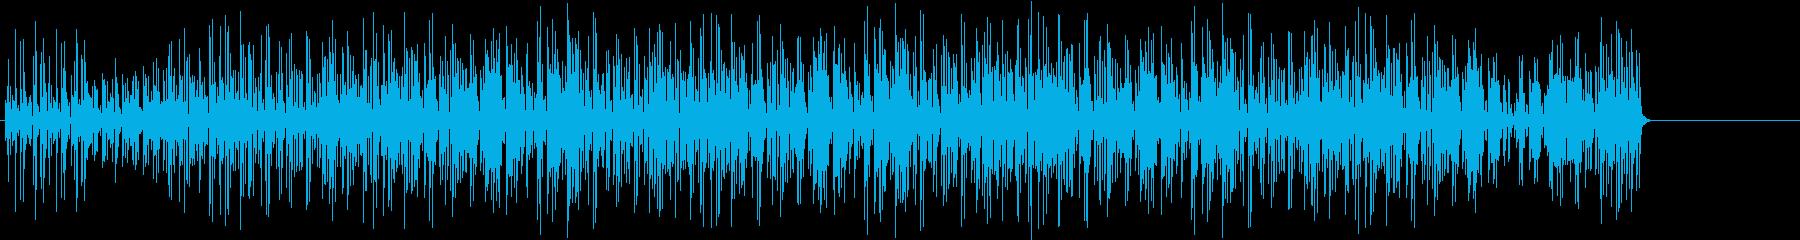 PsycheでFunkyなEDM風BGMの再生済みの波形